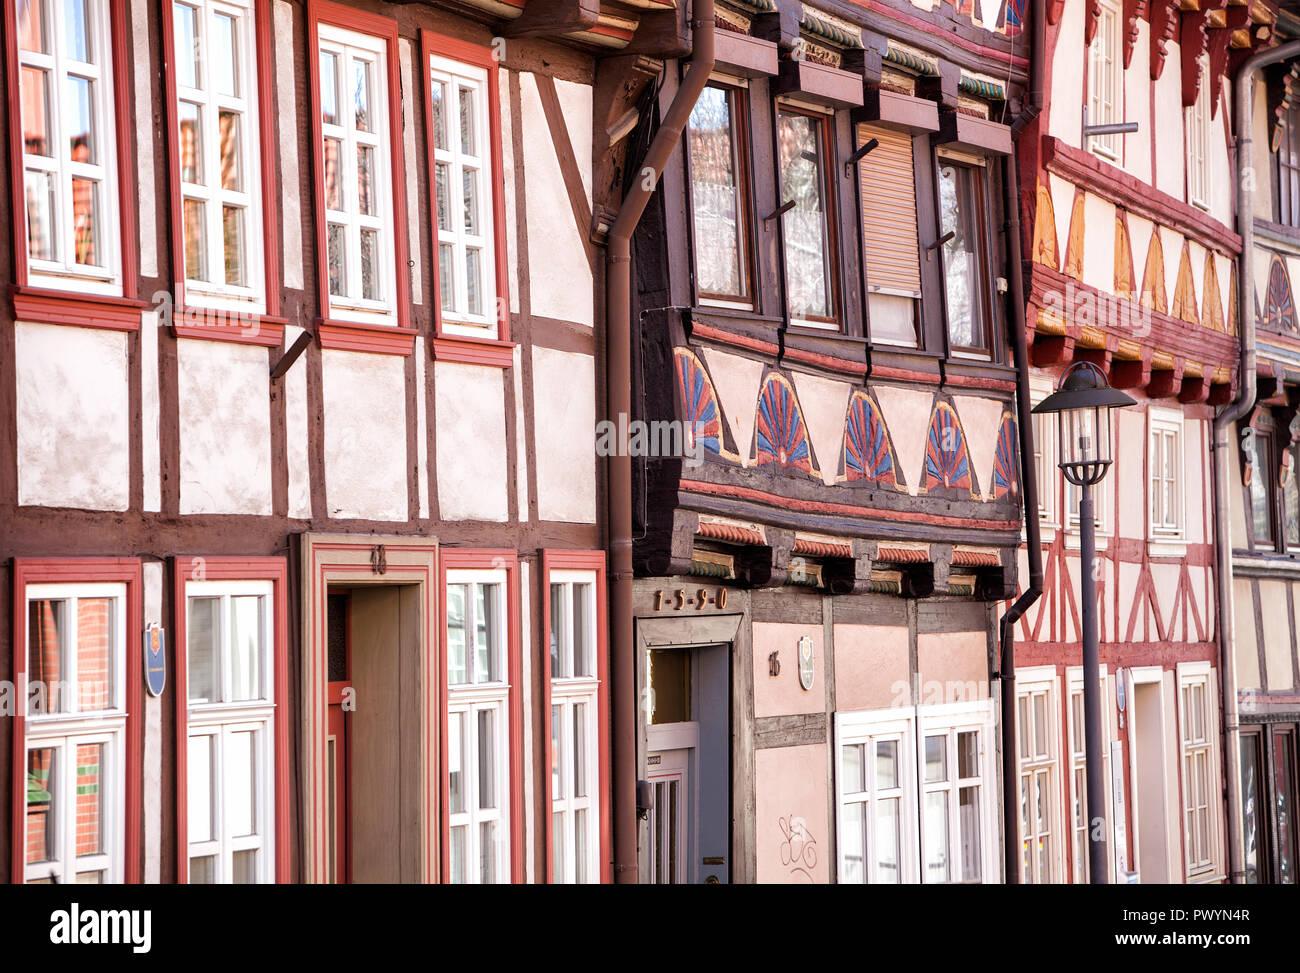 Half-timbered houses, Hinterstraße, Duderstadt, Lower Saxony, Germany, Europe - Stock Image